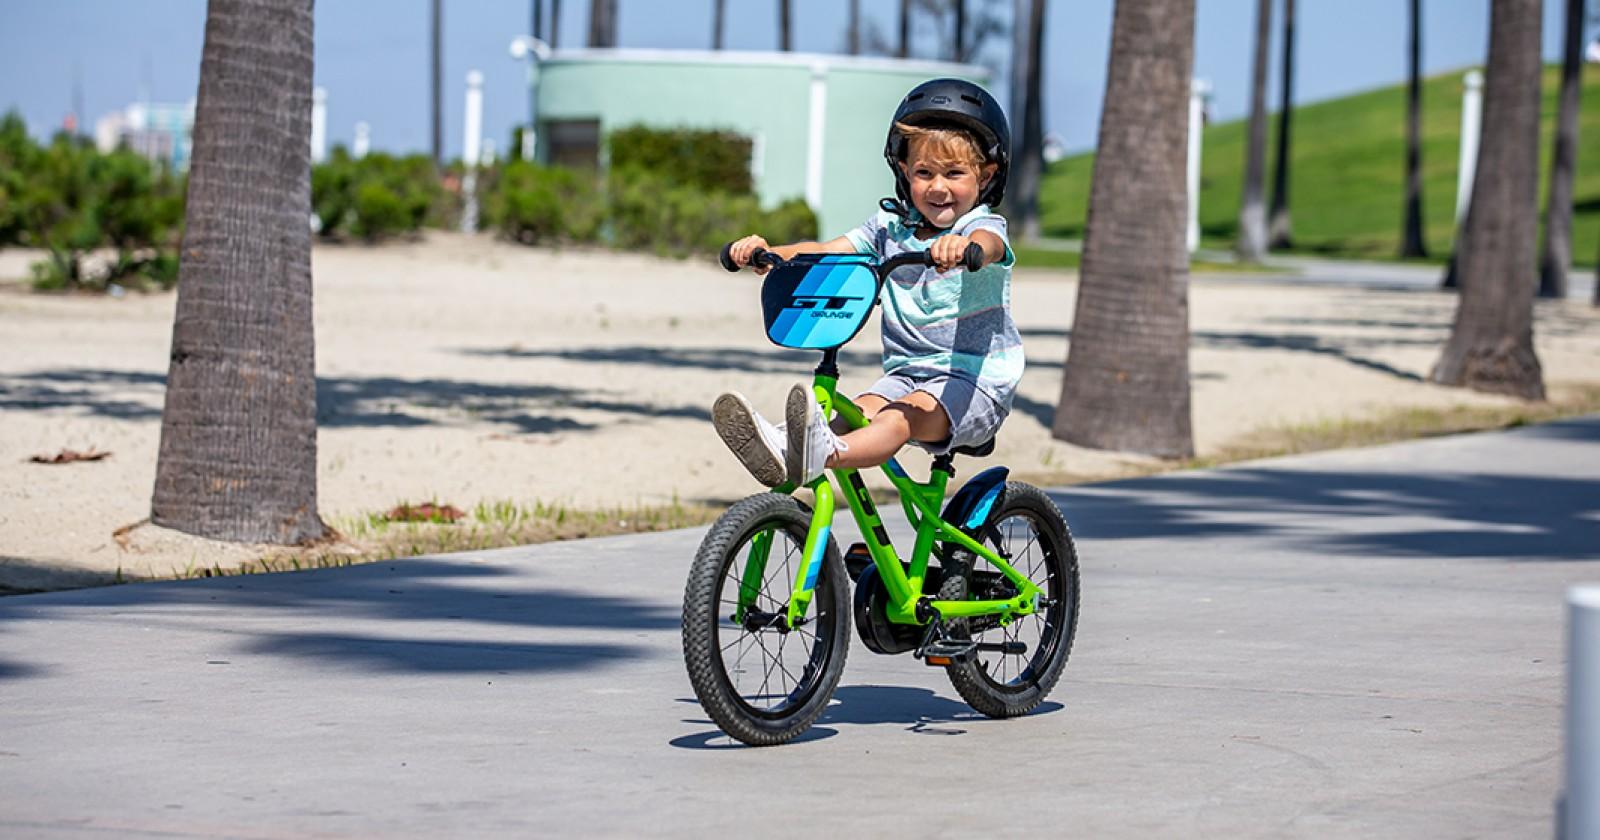 elegir-talla-bici-nino/